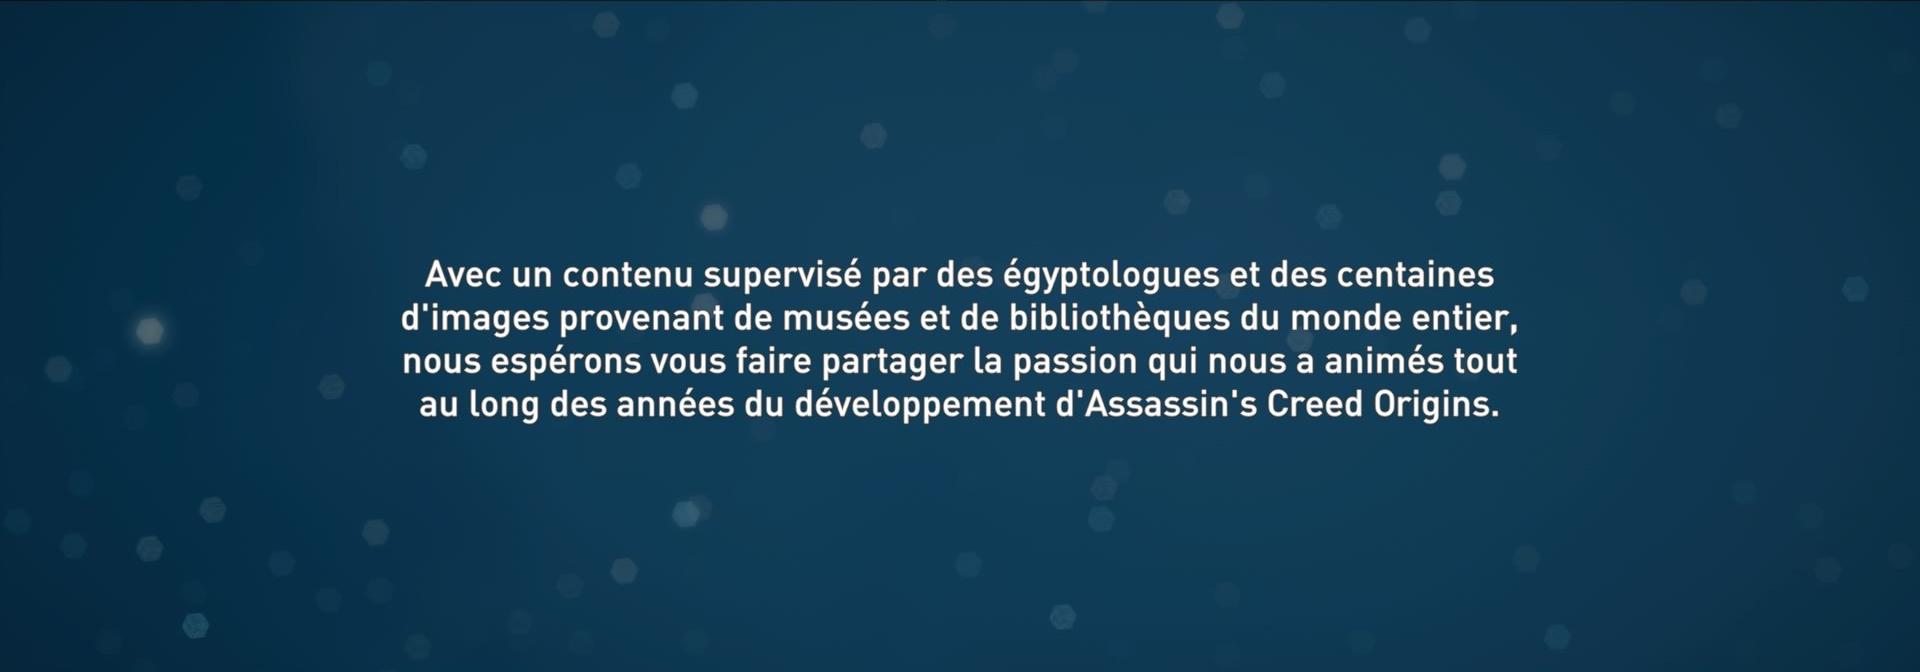 assassins-creedc2ae-origins_20180308212708.jpg